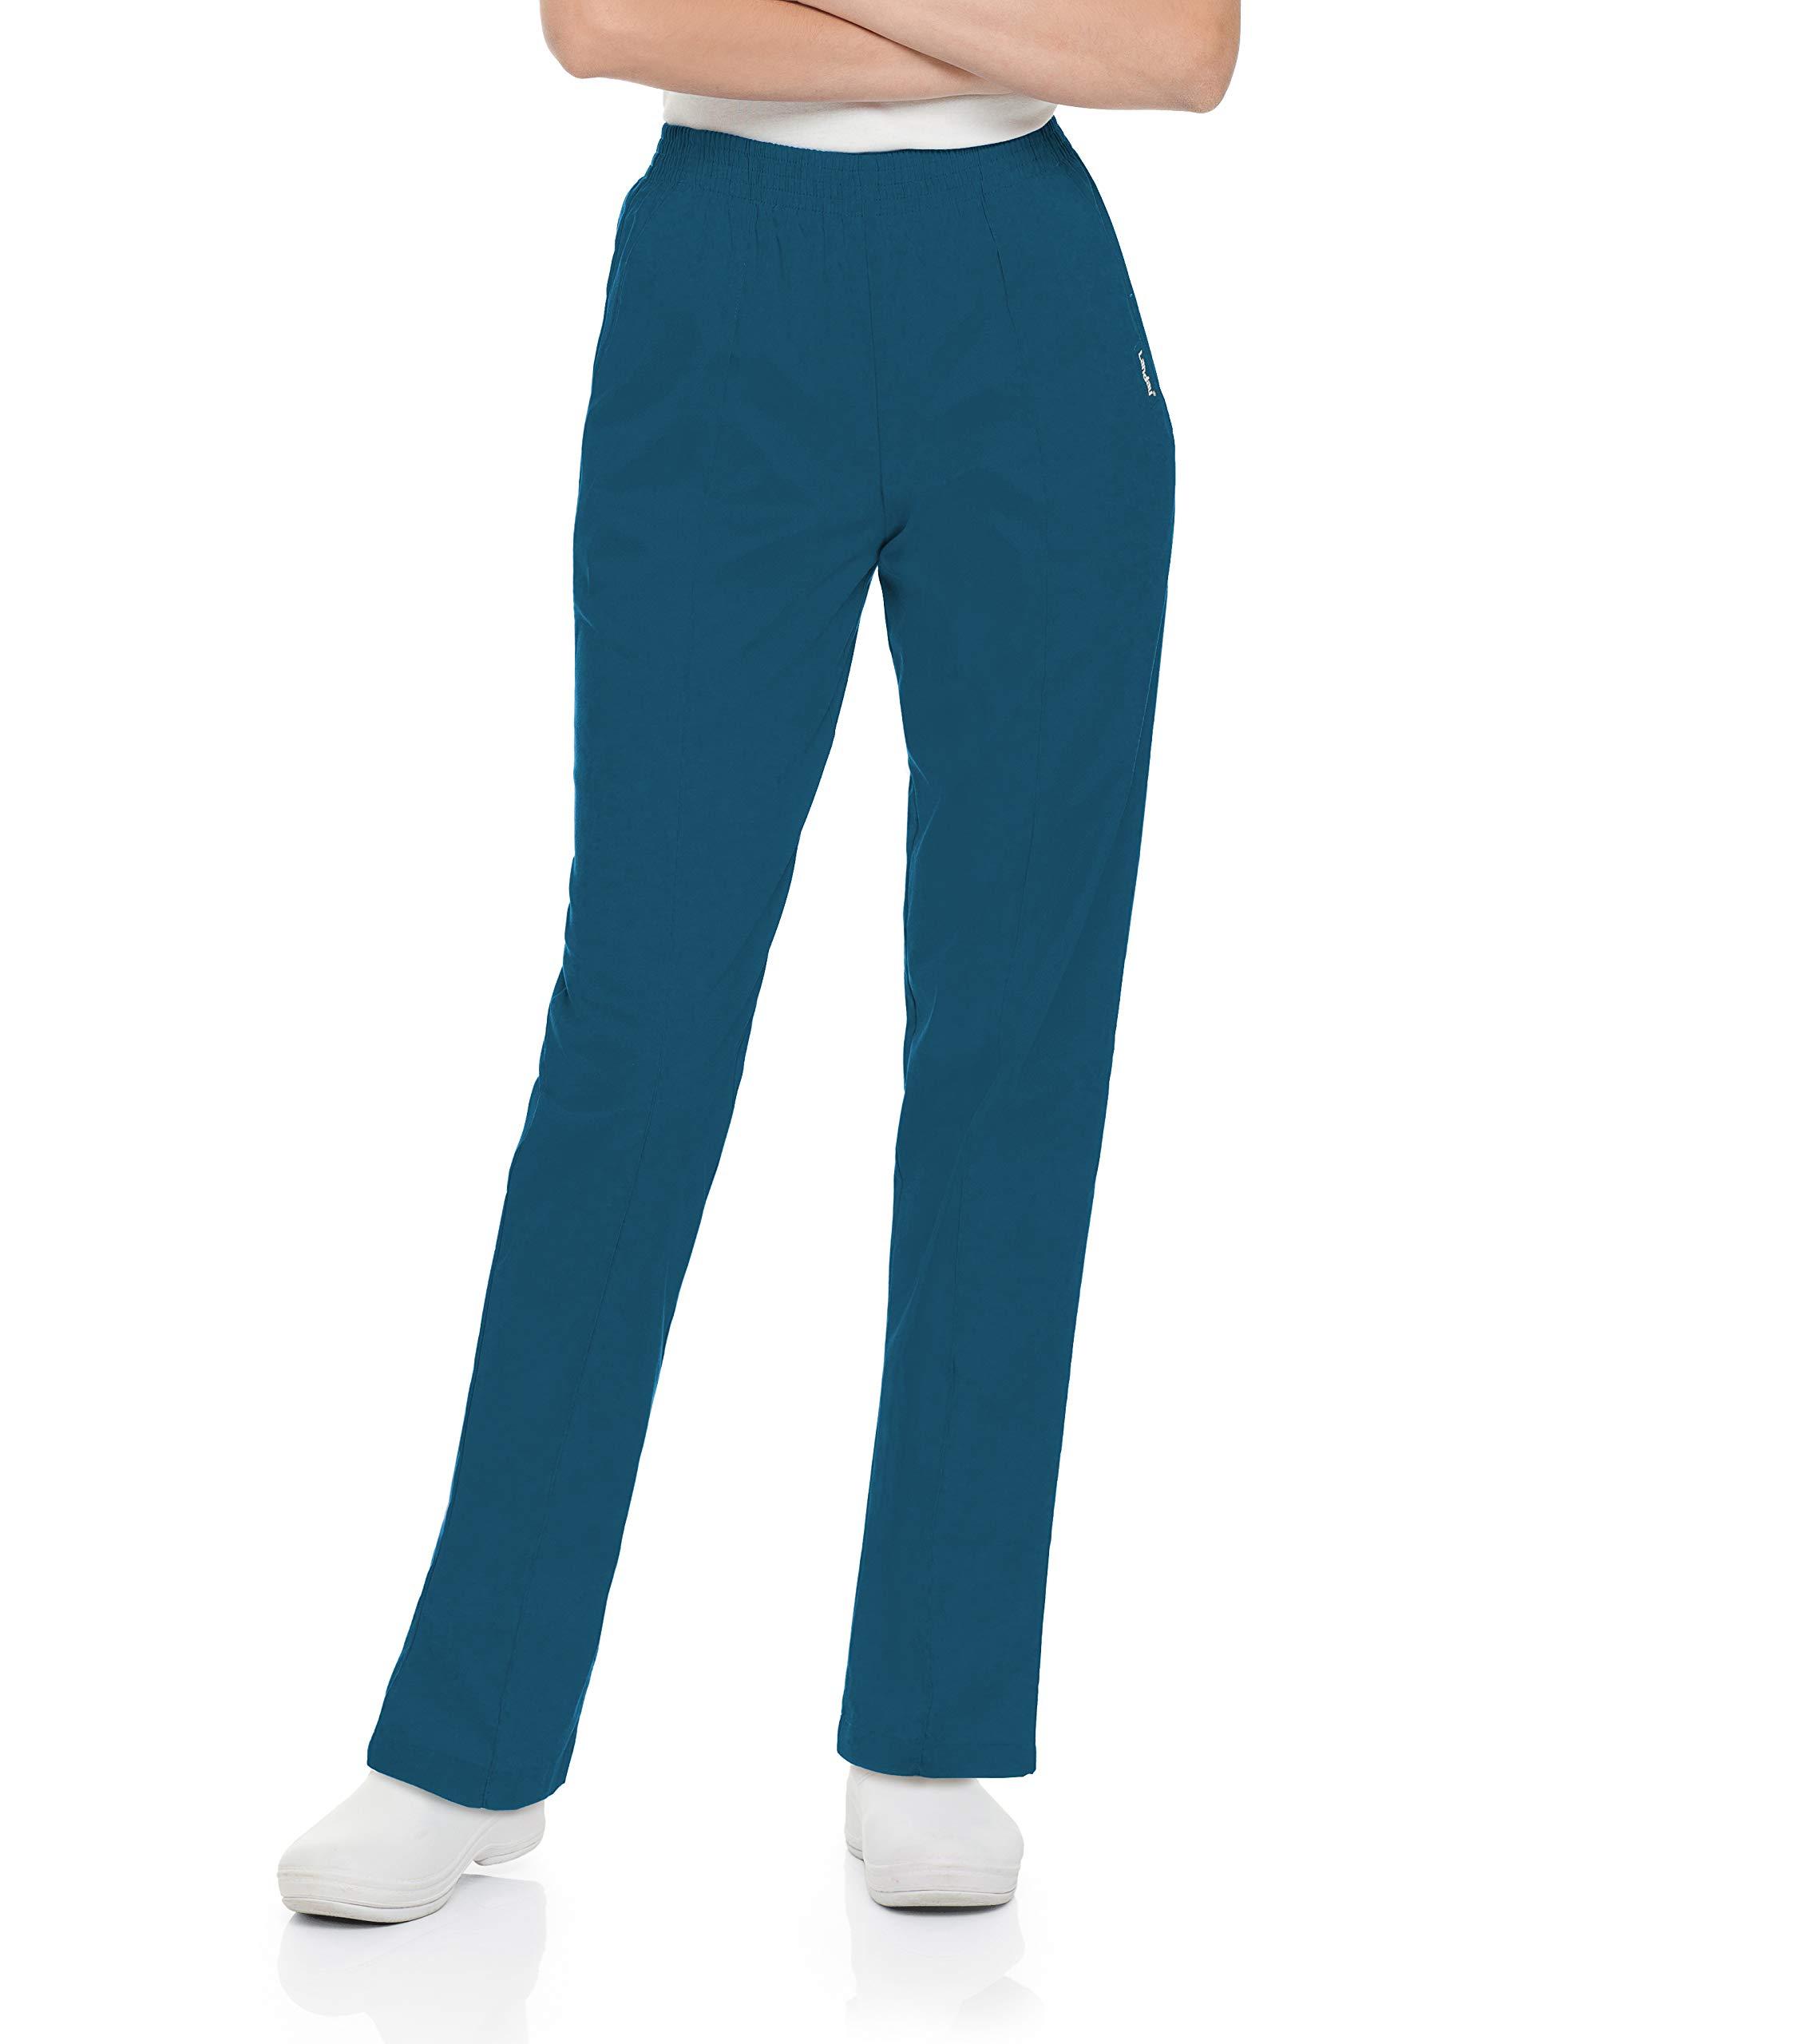 Landau Women's Comfortable 2-Pocket Classic Fit Medical Scrub Pant Uniform, Caribbean Blue, X-Small Petite